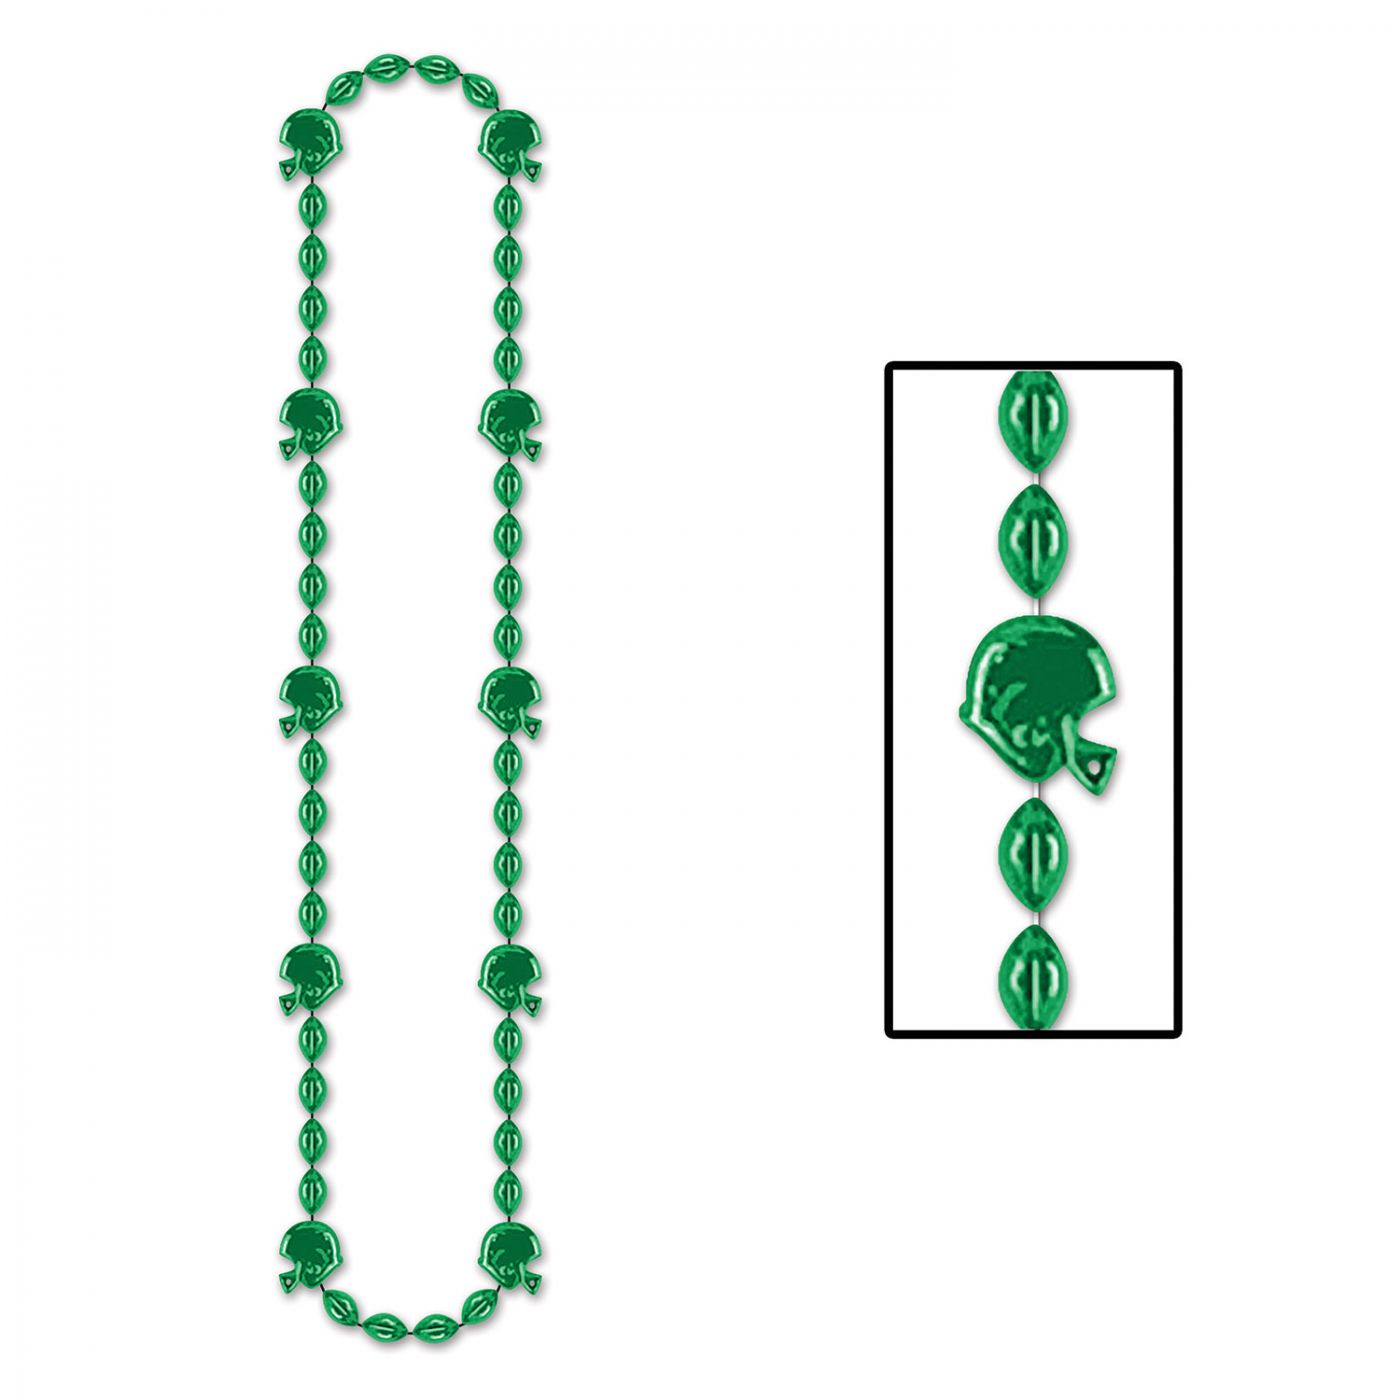 Football Beads image